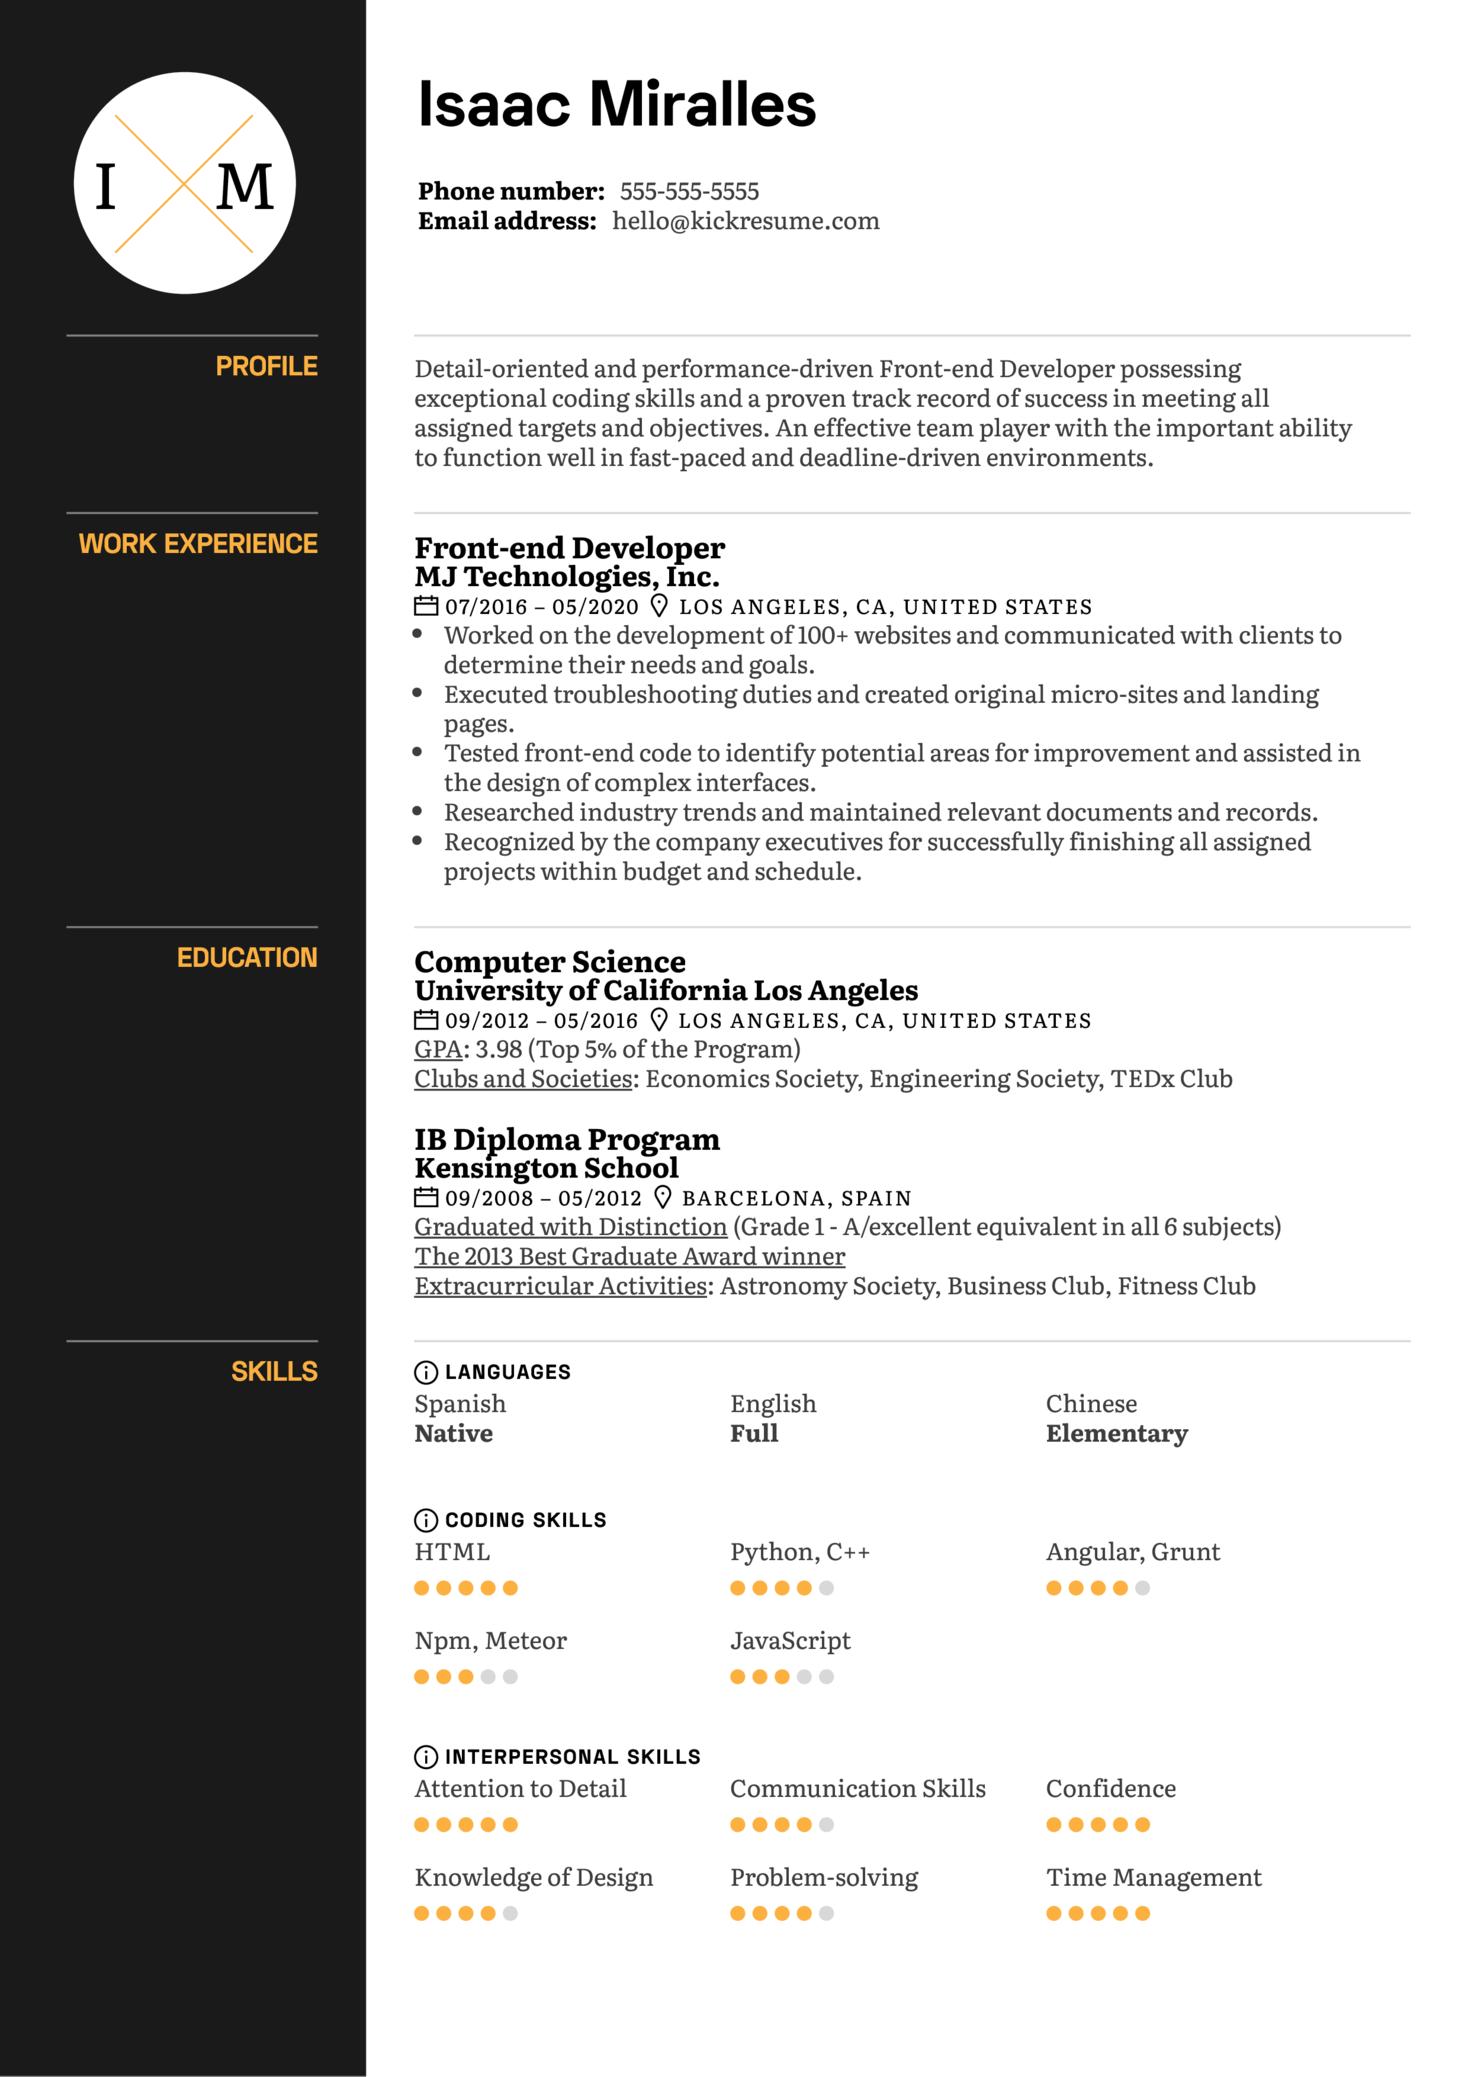 Skills on Resume Example (Part 1)